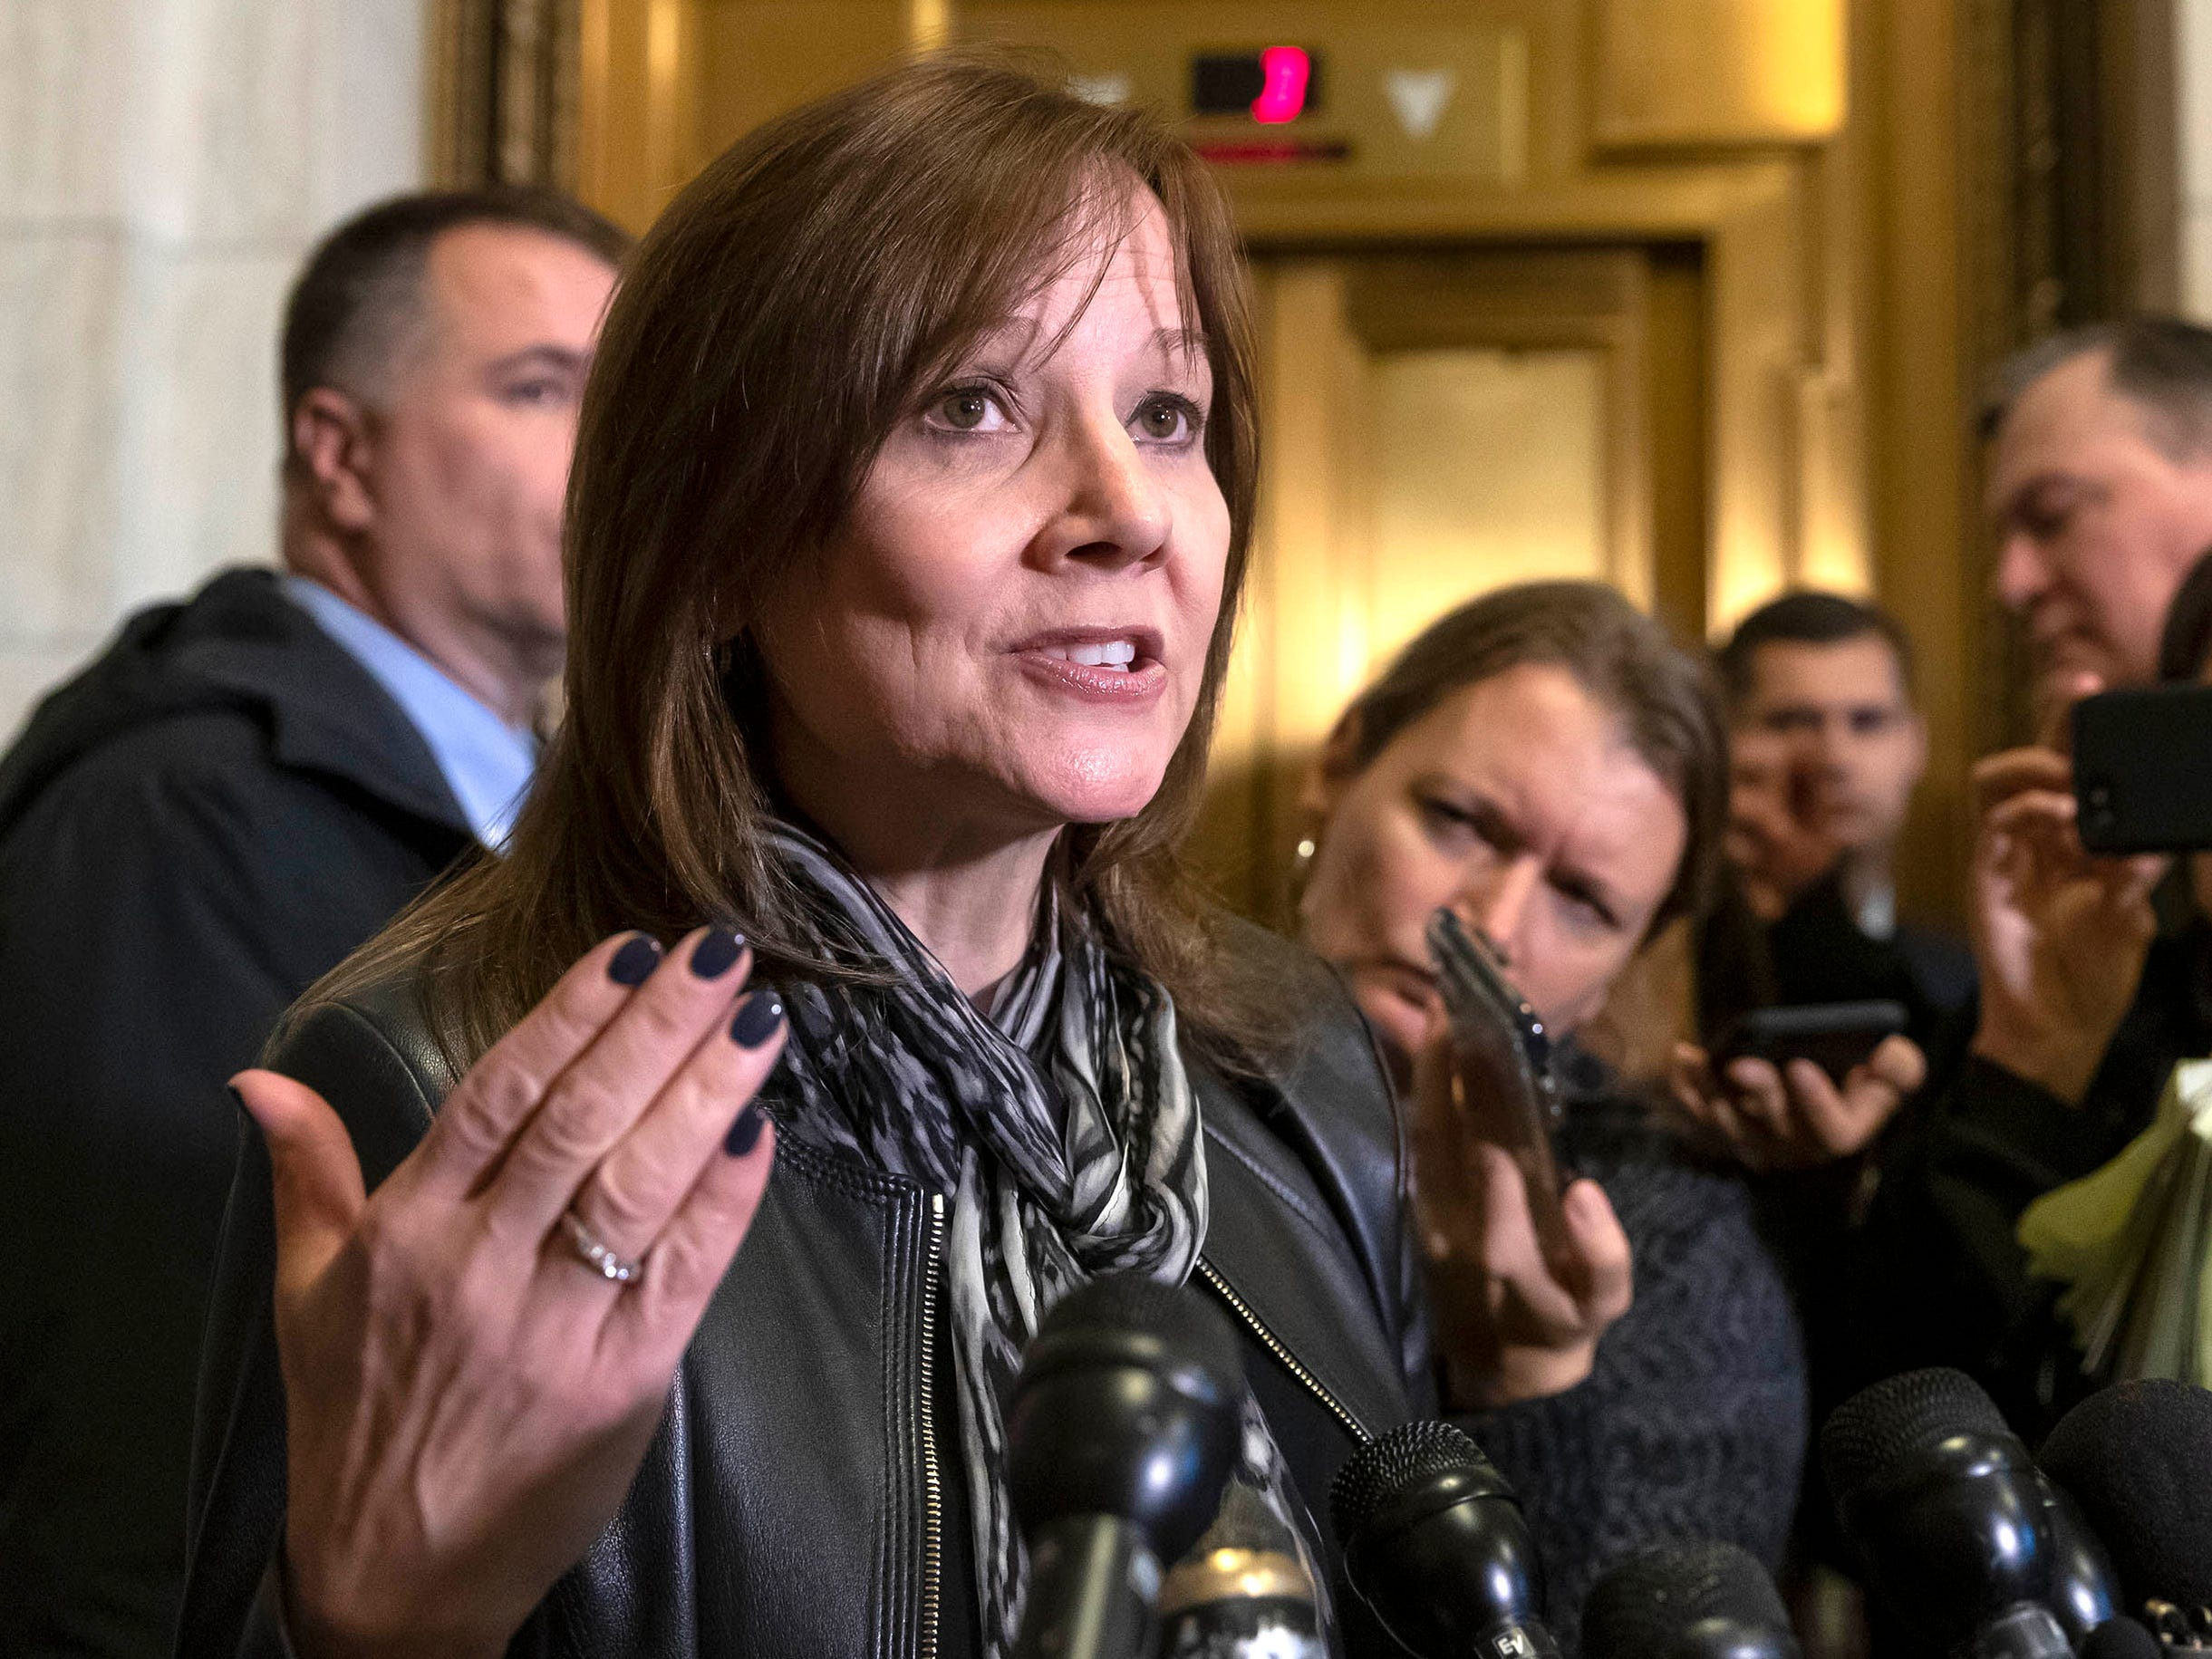 CEO Mary Barra tells members of Congress: GM must move forward